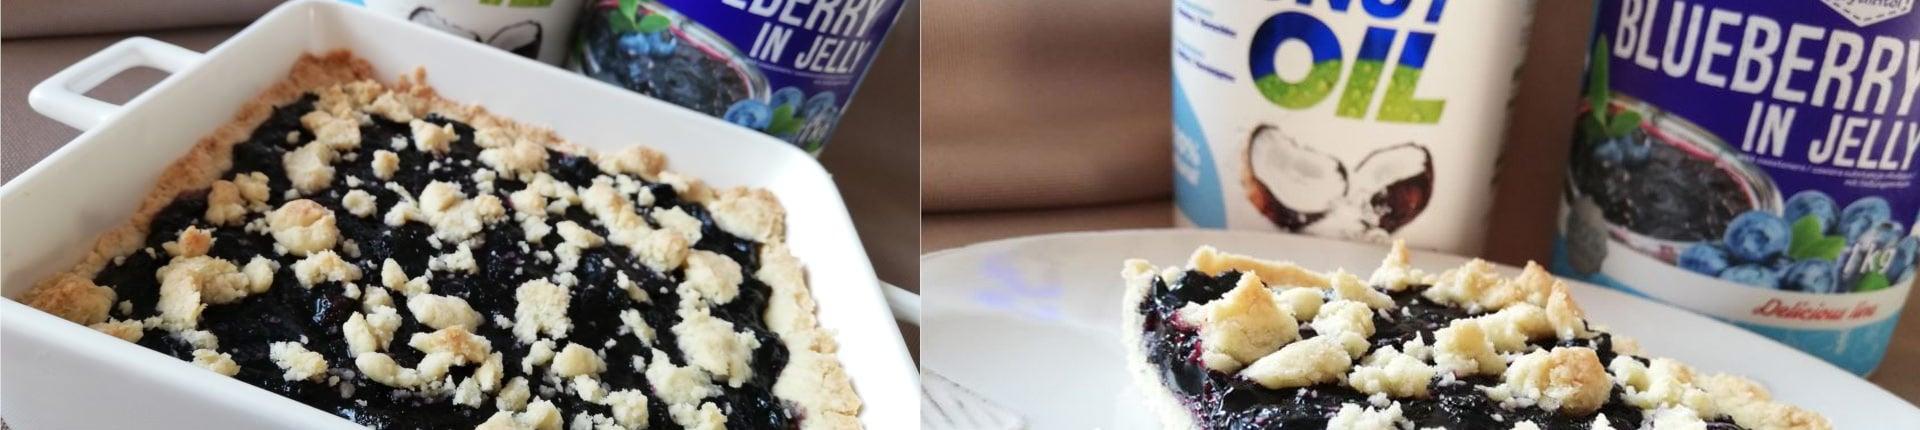 Ciasto jagodowe bez cukru